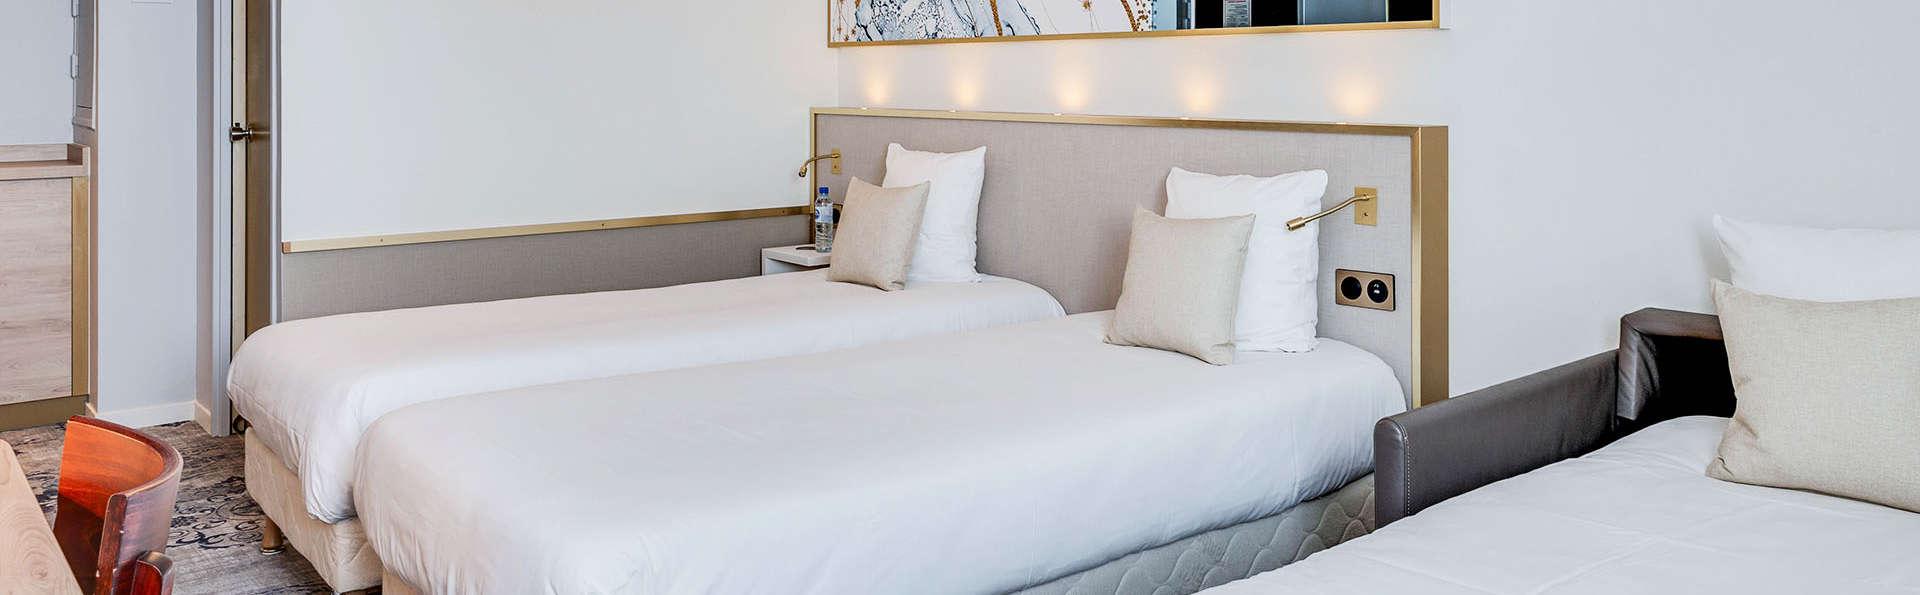 Brit Hotel Orléans St Jean de Braye - L'Antarès - EDIT_Meero-photo_02.jpg